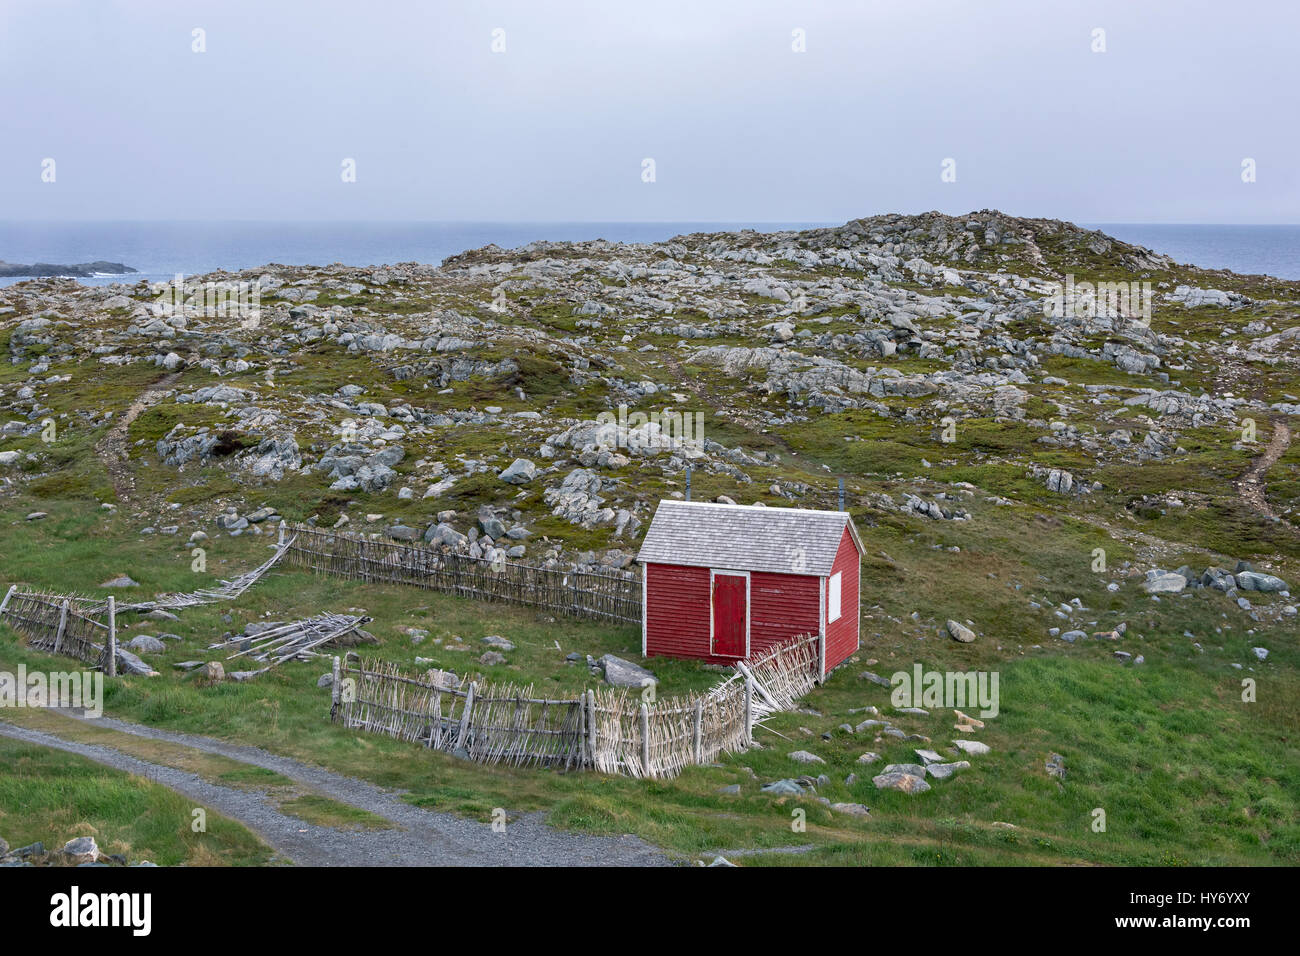 Rocky shore and red shed, Cape Bonavista, Newfoundland - Stock Image